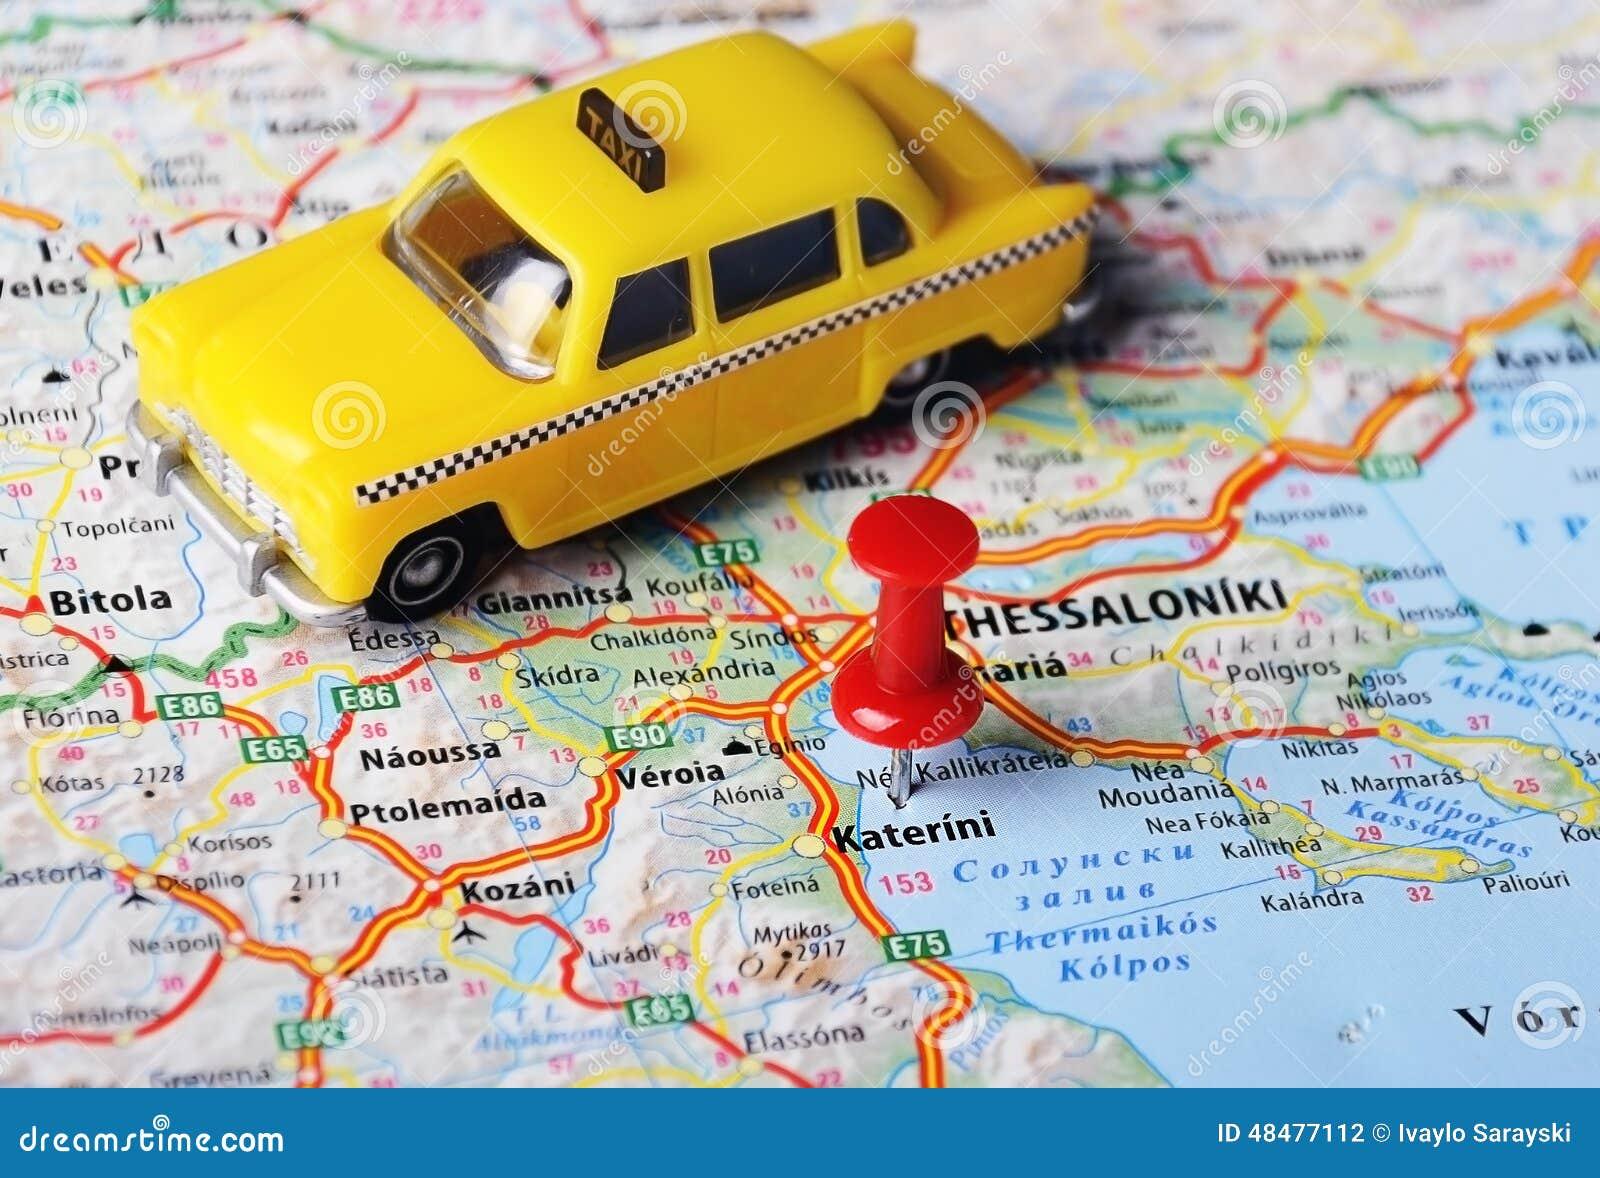 Katerini Grecja Mapy Taxi Zdjecie Stock Obraz Zlozonej Z